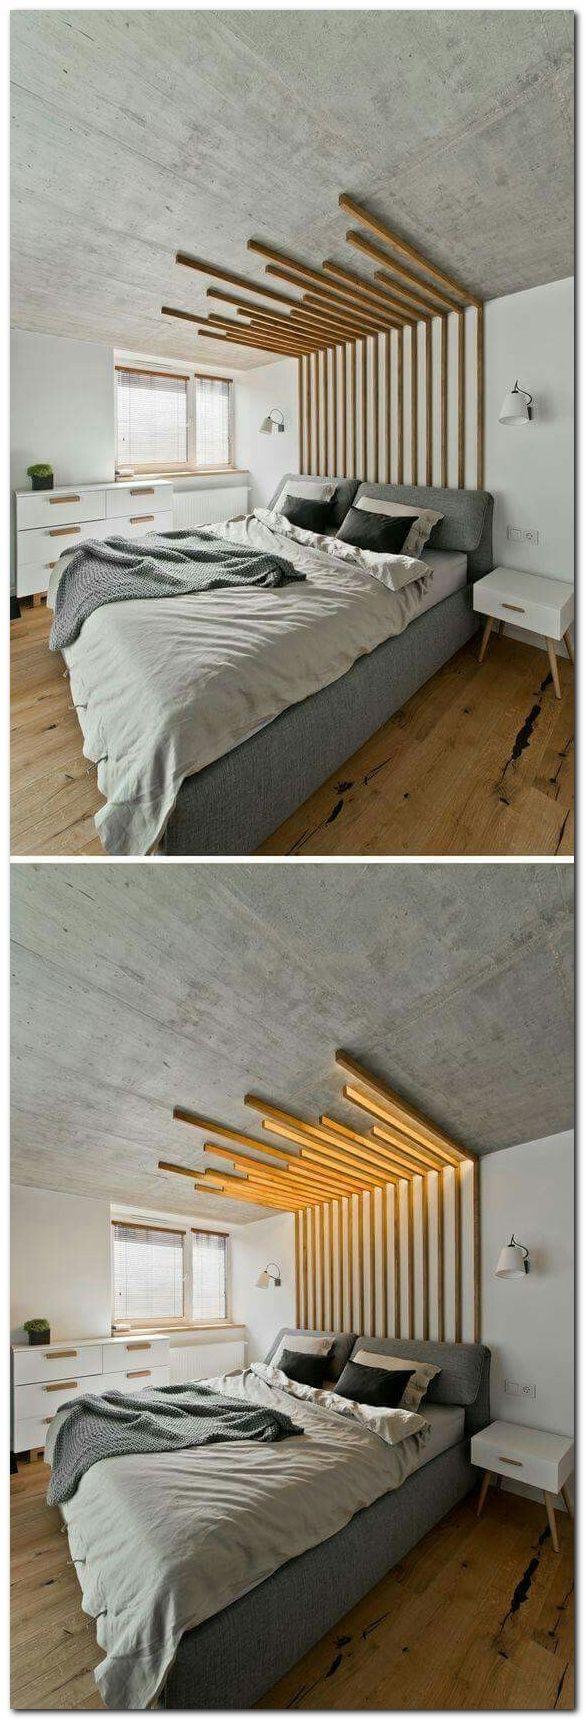 69dcb59d3cb9d49d6b8539db449daf1a laminate flooring on walls modern interiors